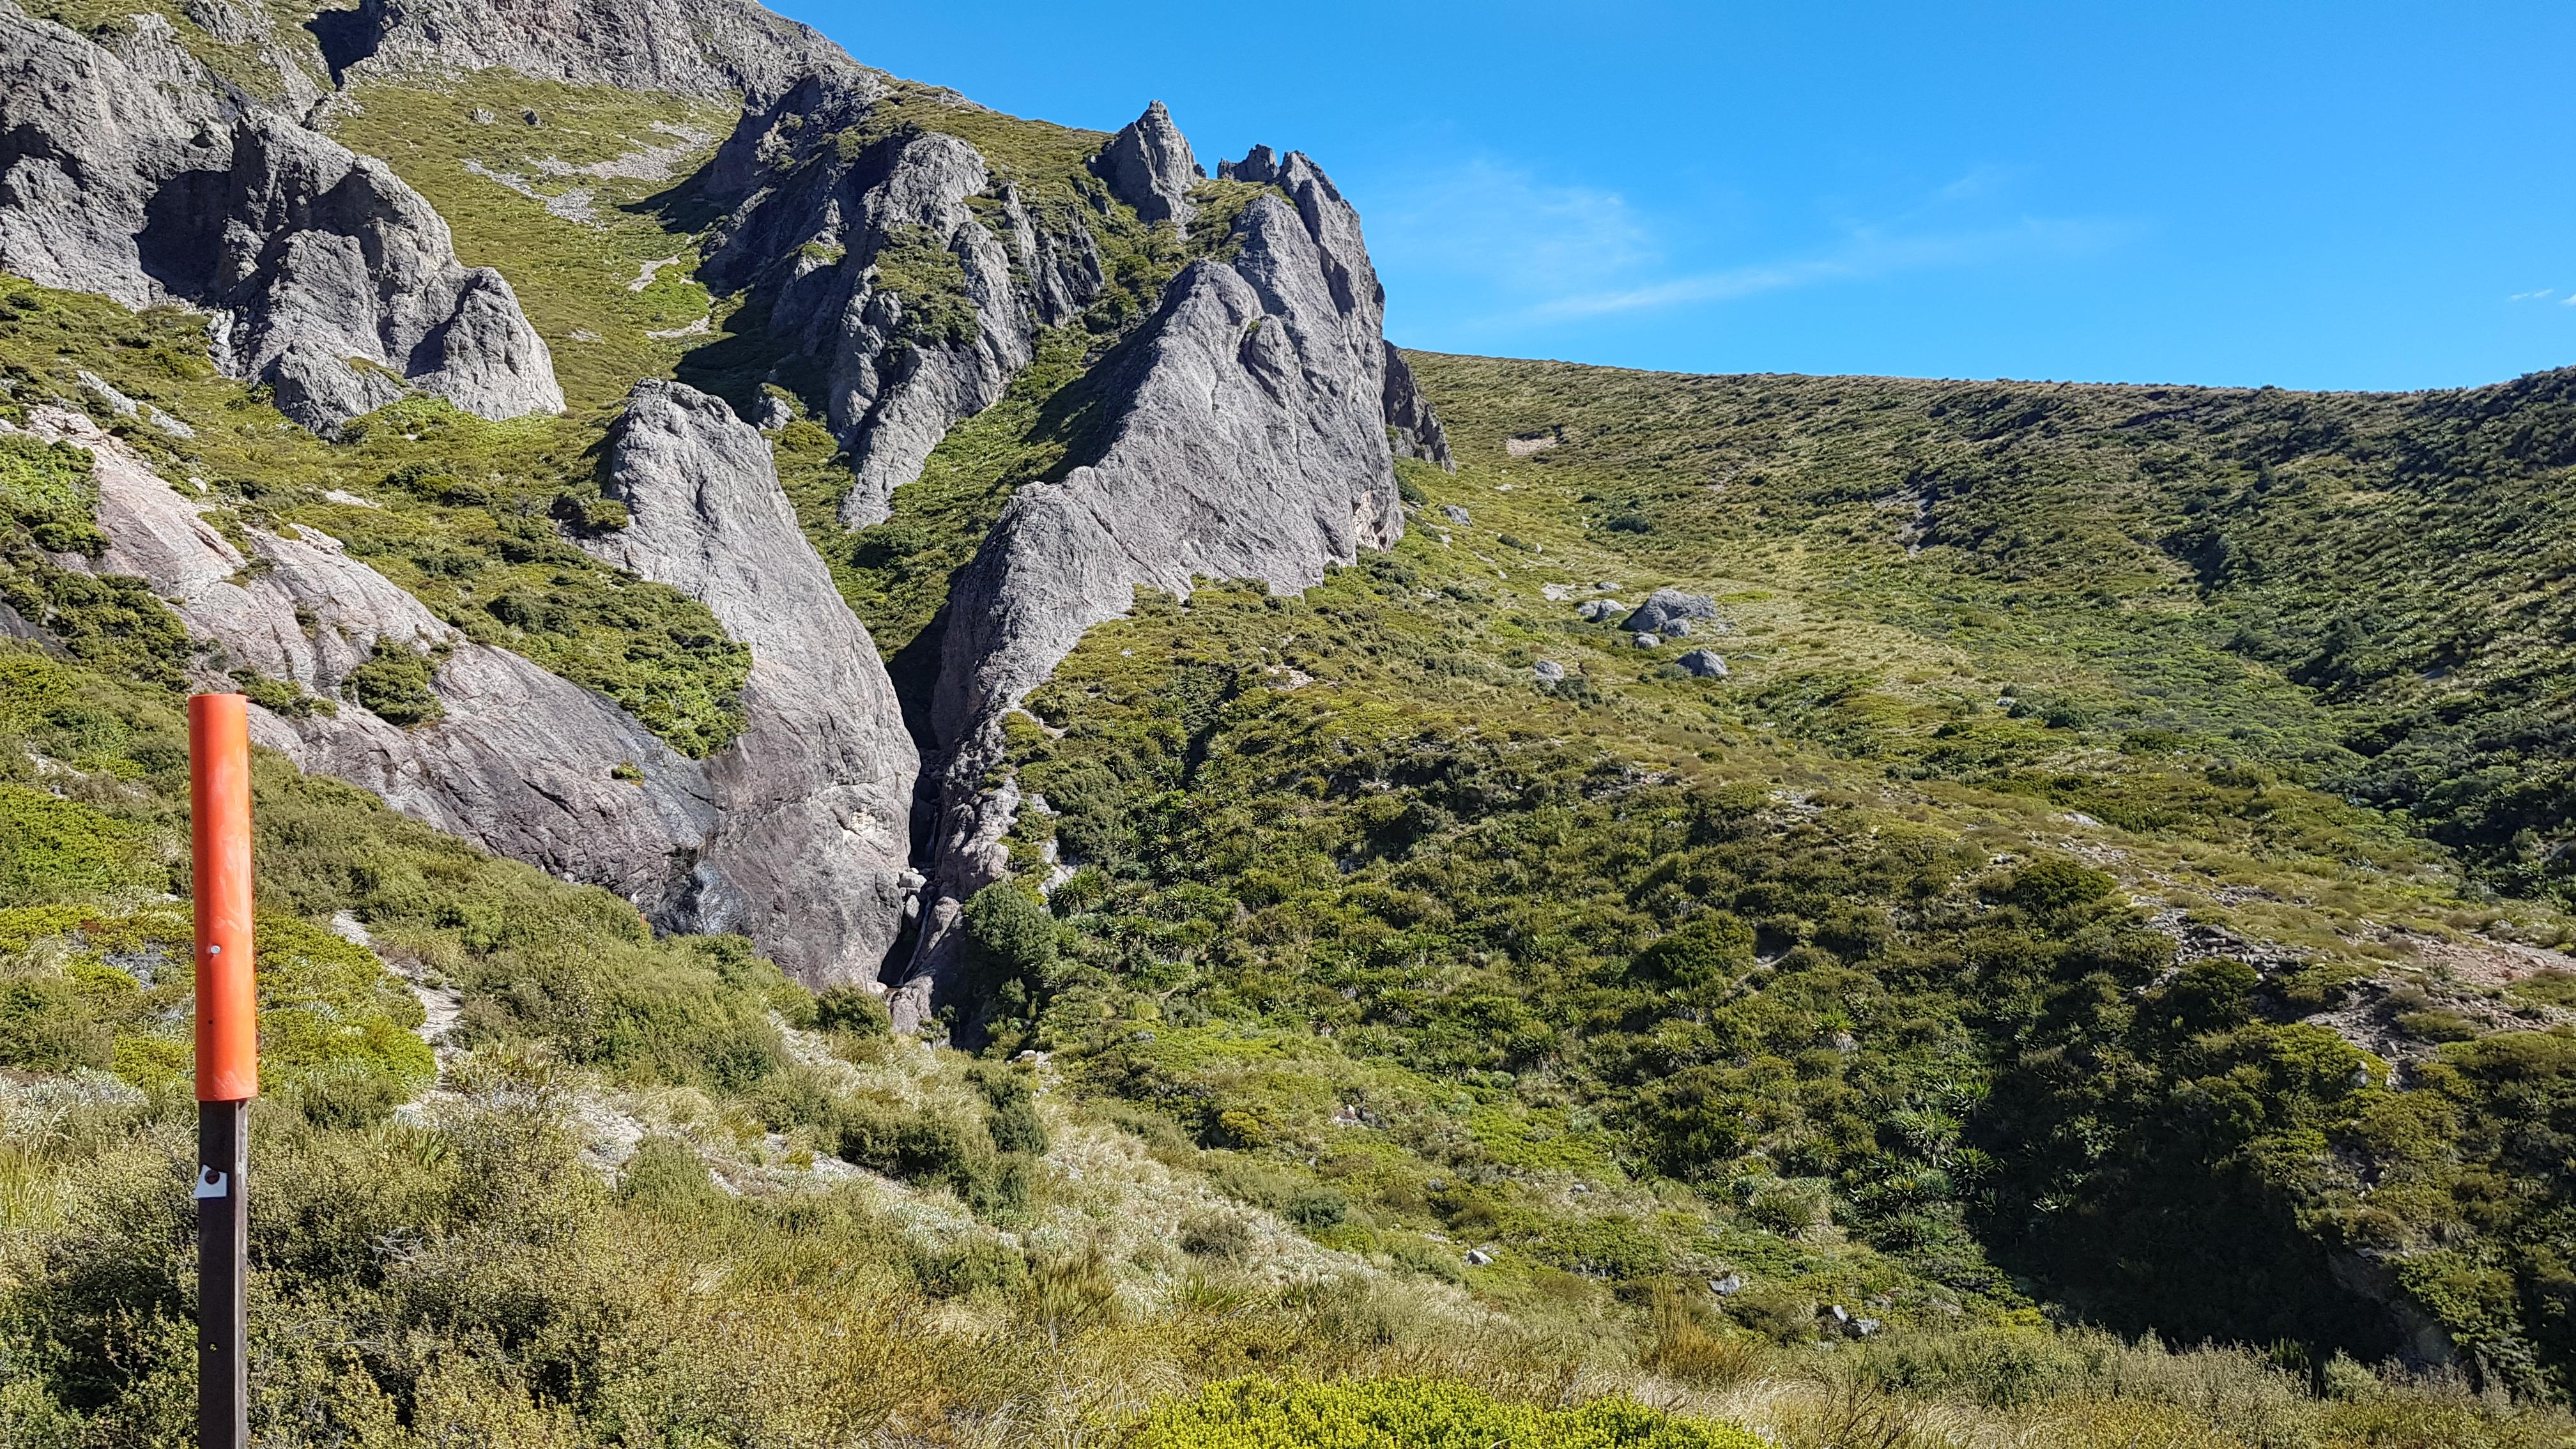 Pinnacles hut to Woolshed Creek hut